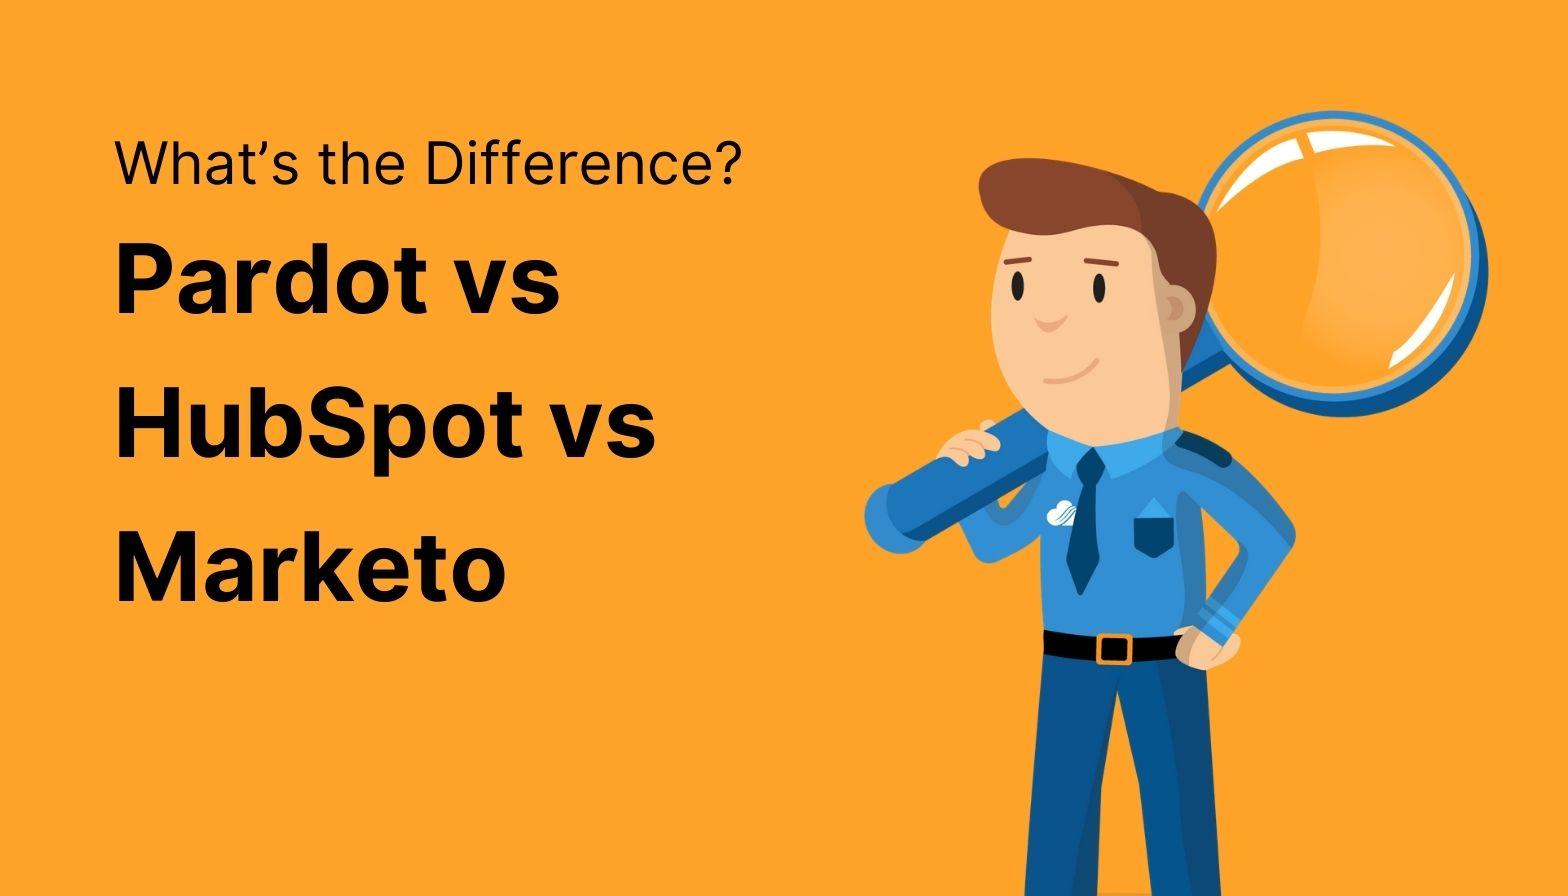 Pardot vs HubSpot vs Marketo: What's the Difference?